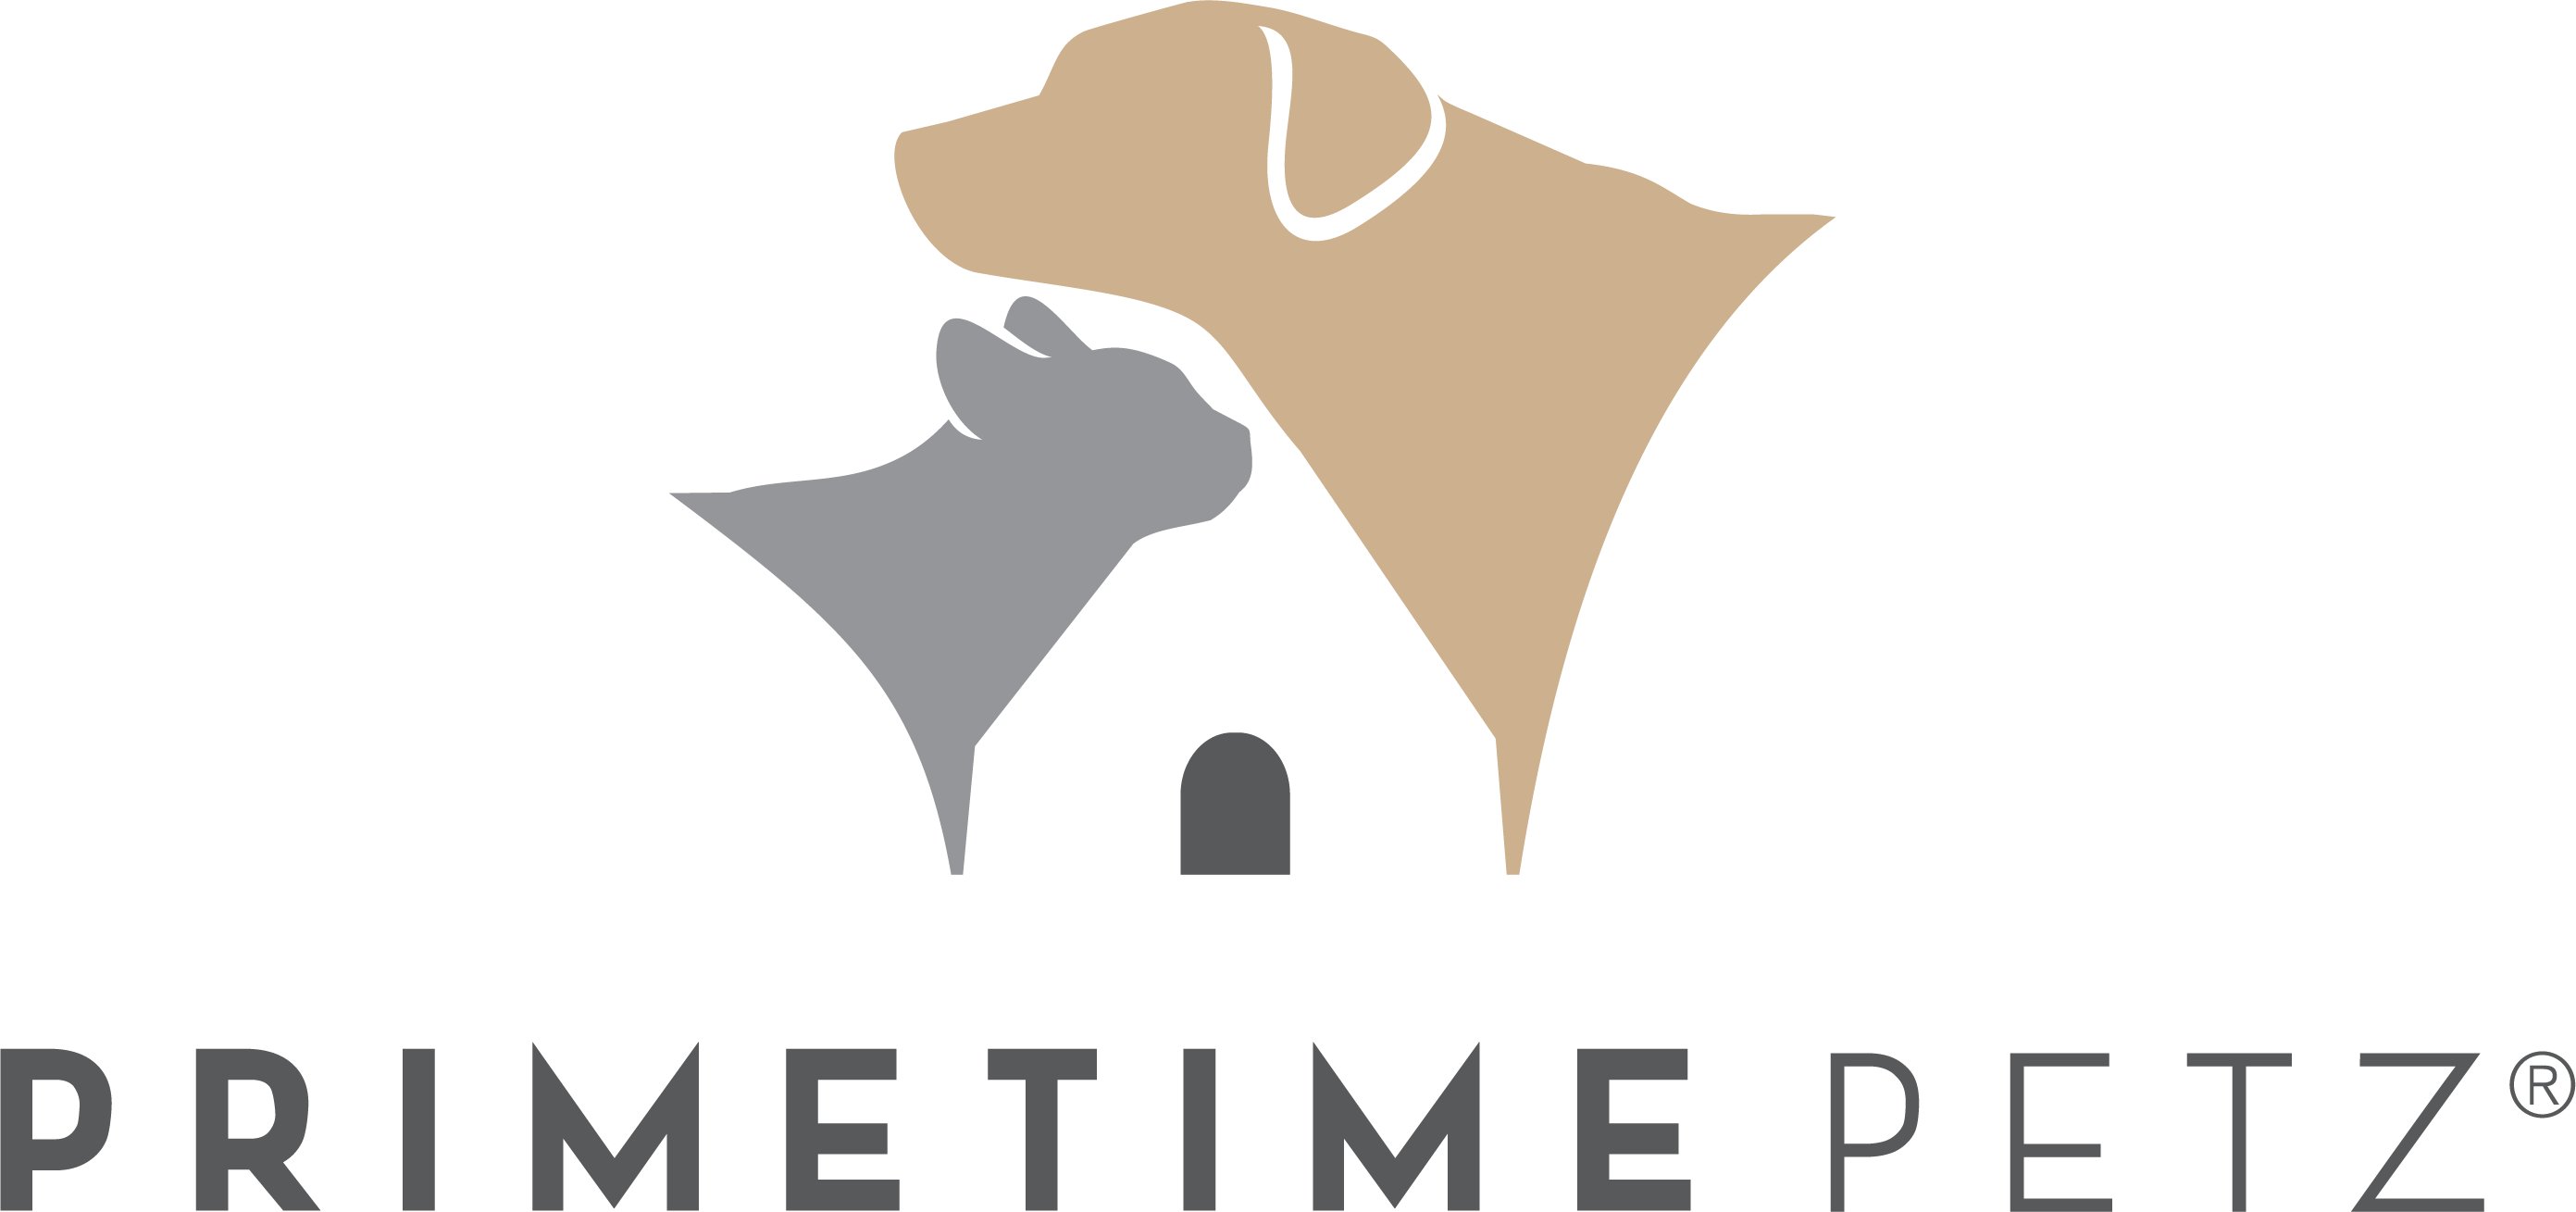 Primetime Petz logo